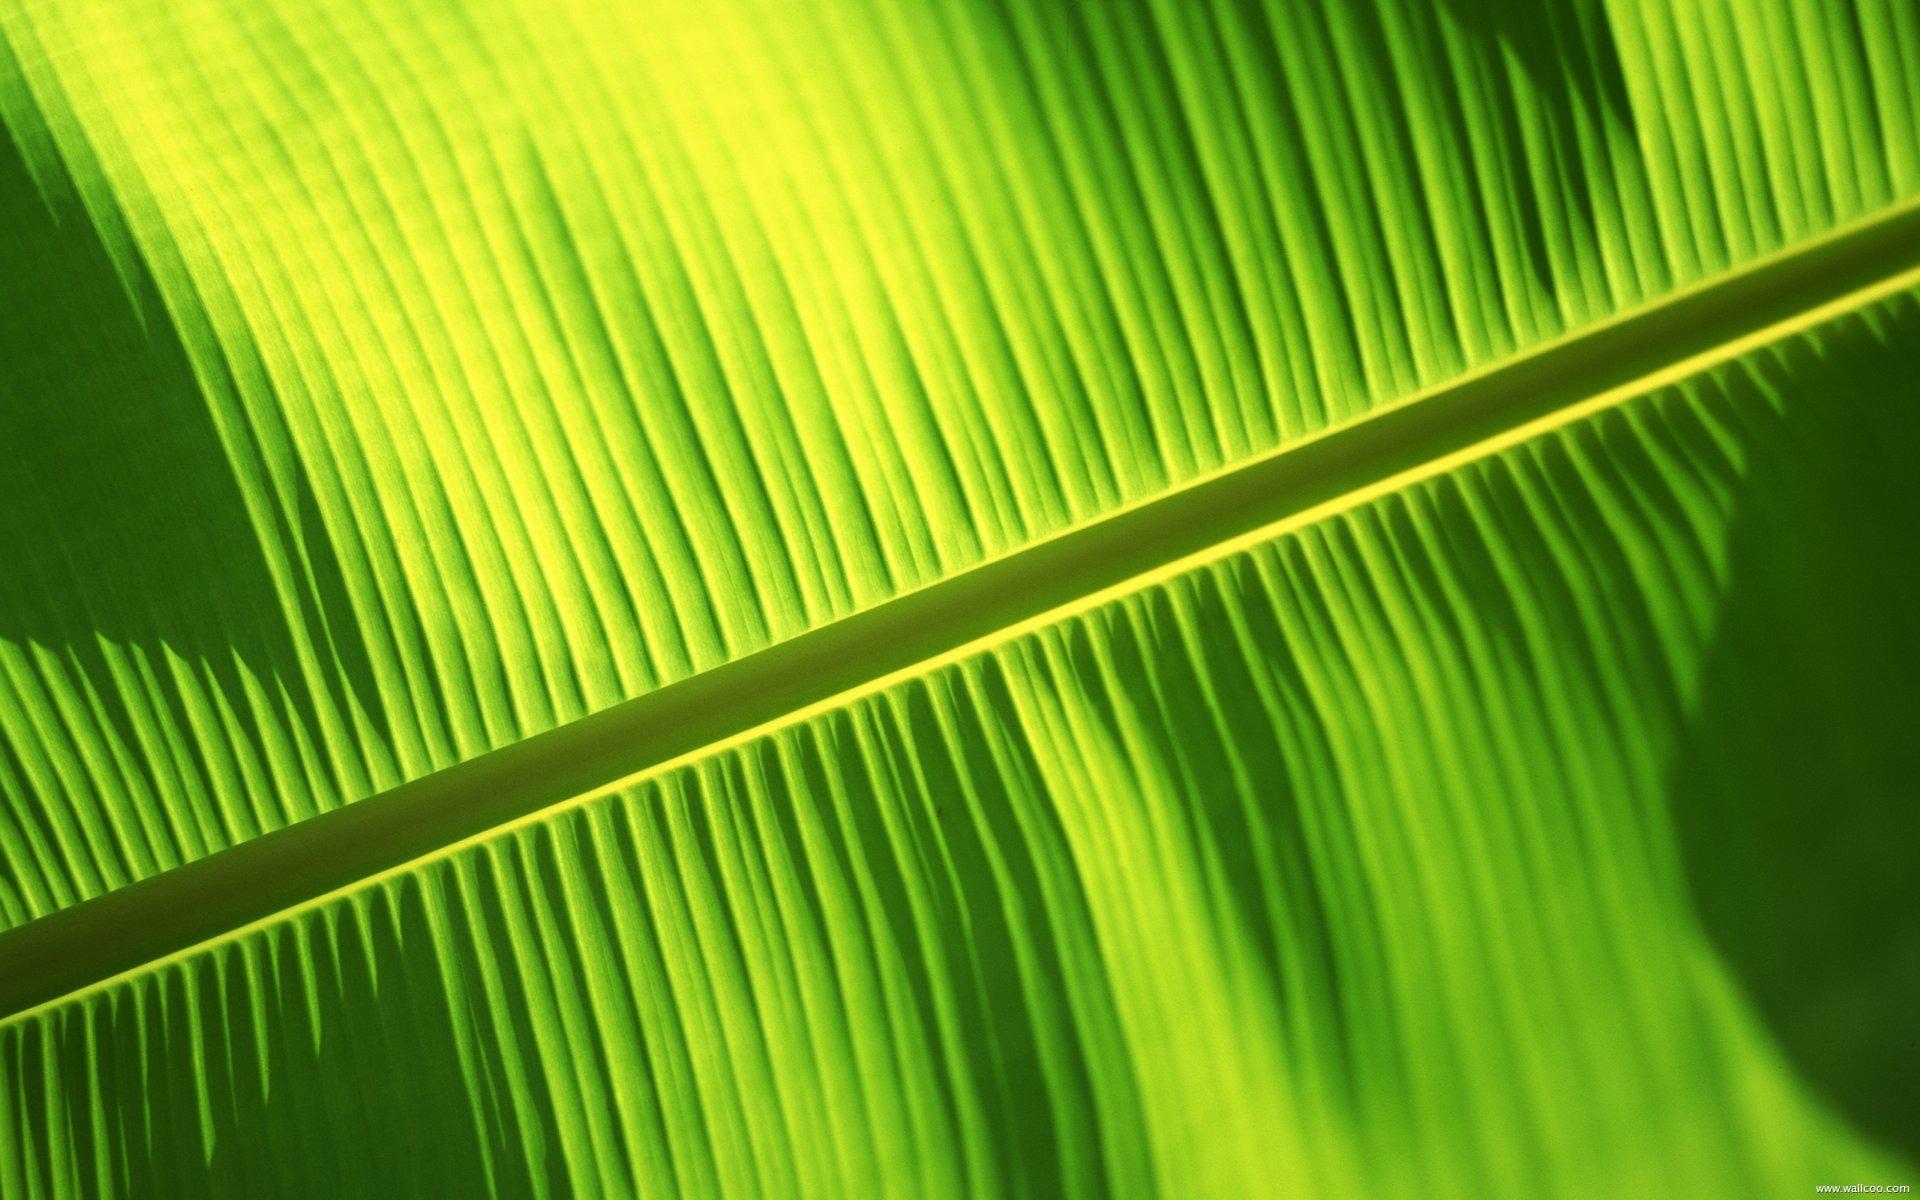 Bali Banana Leaf Wallpaper Download 1920x1200px